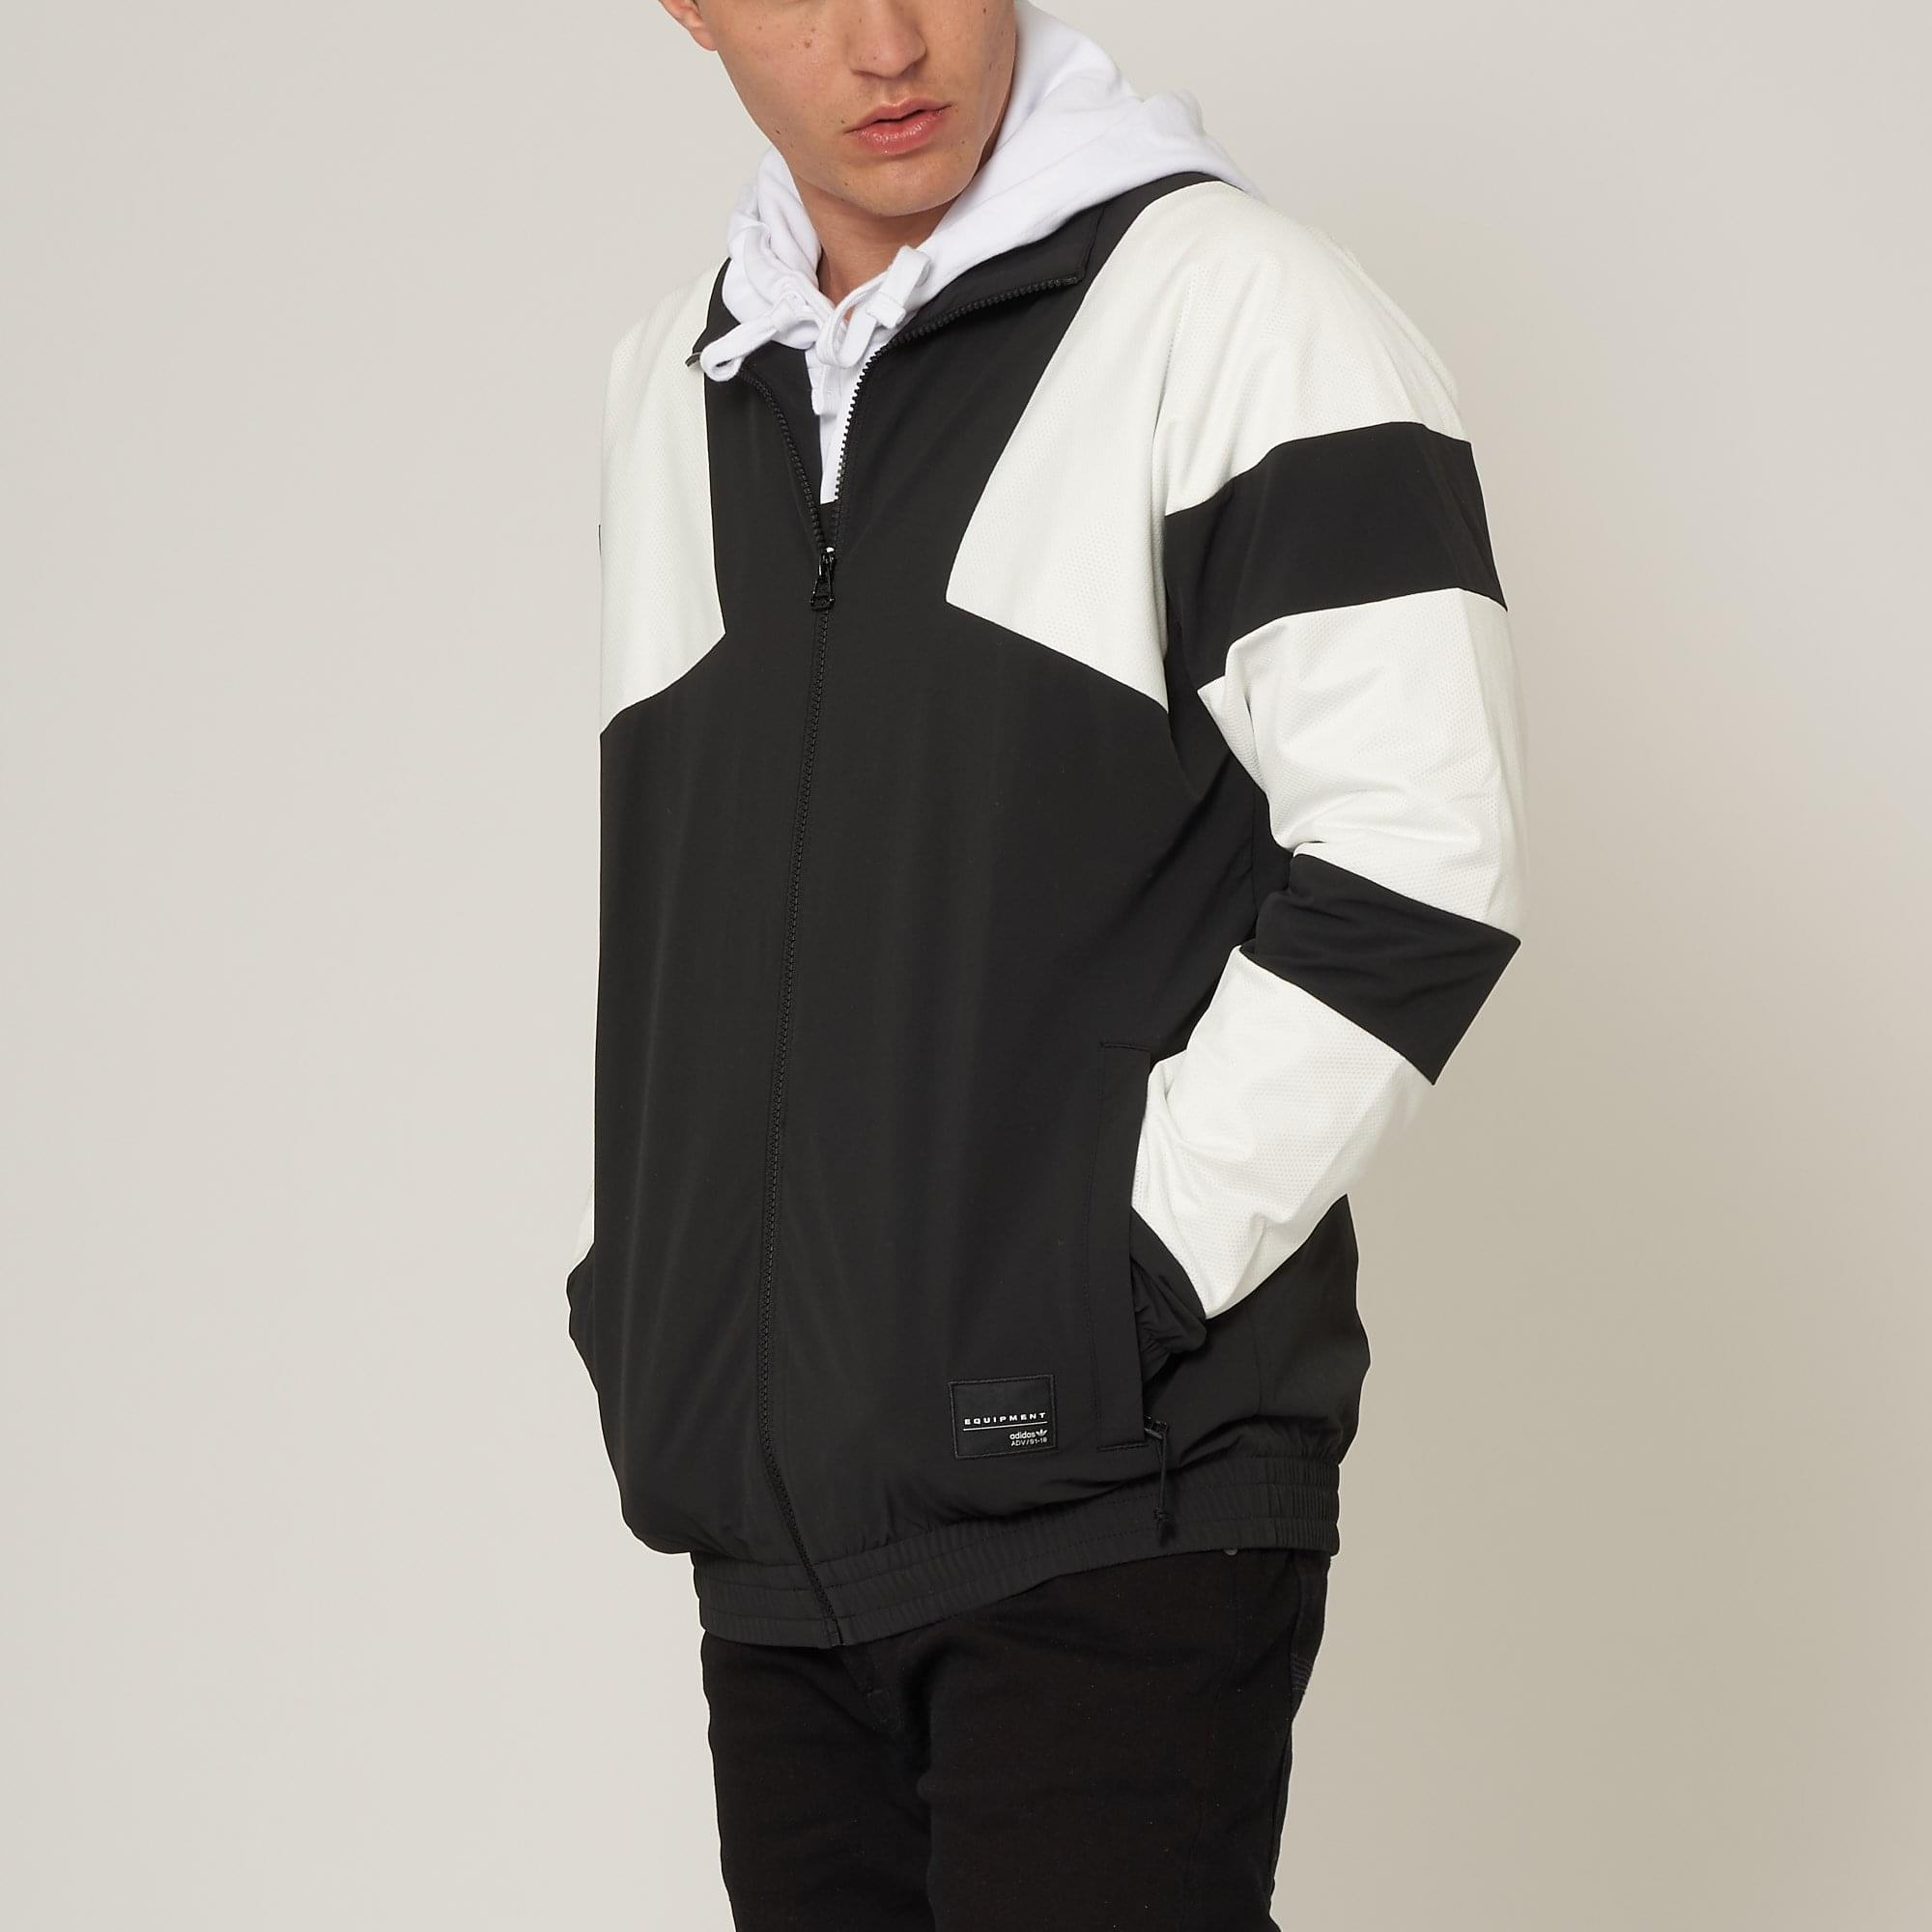 adidas Originals Black & White EQT Bold 2.0 Track Jacket